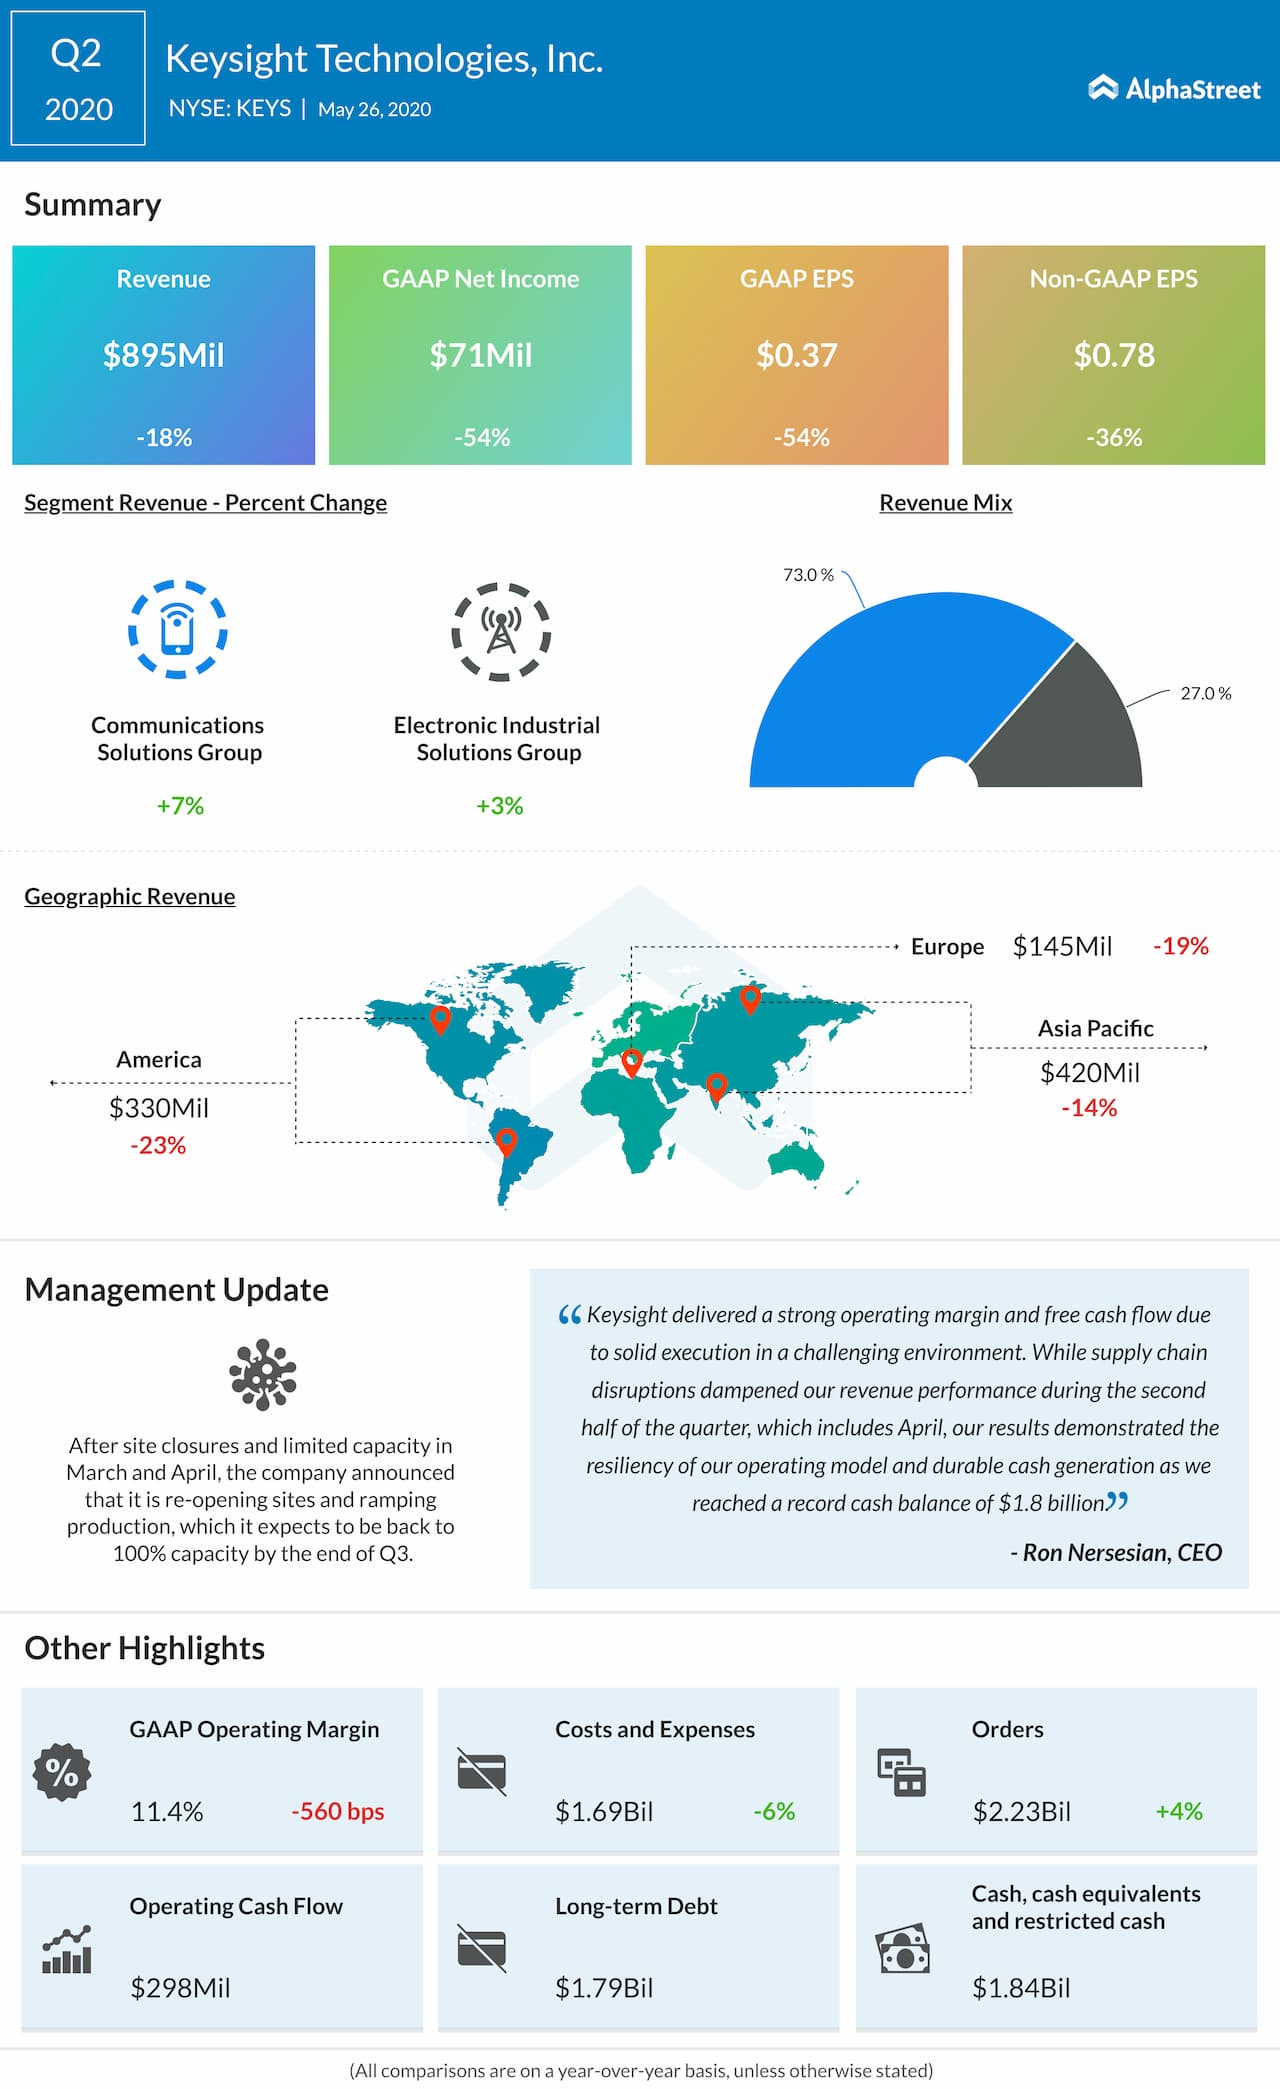 Keysight Technologies (KEYS) Q2 2020 earnings review